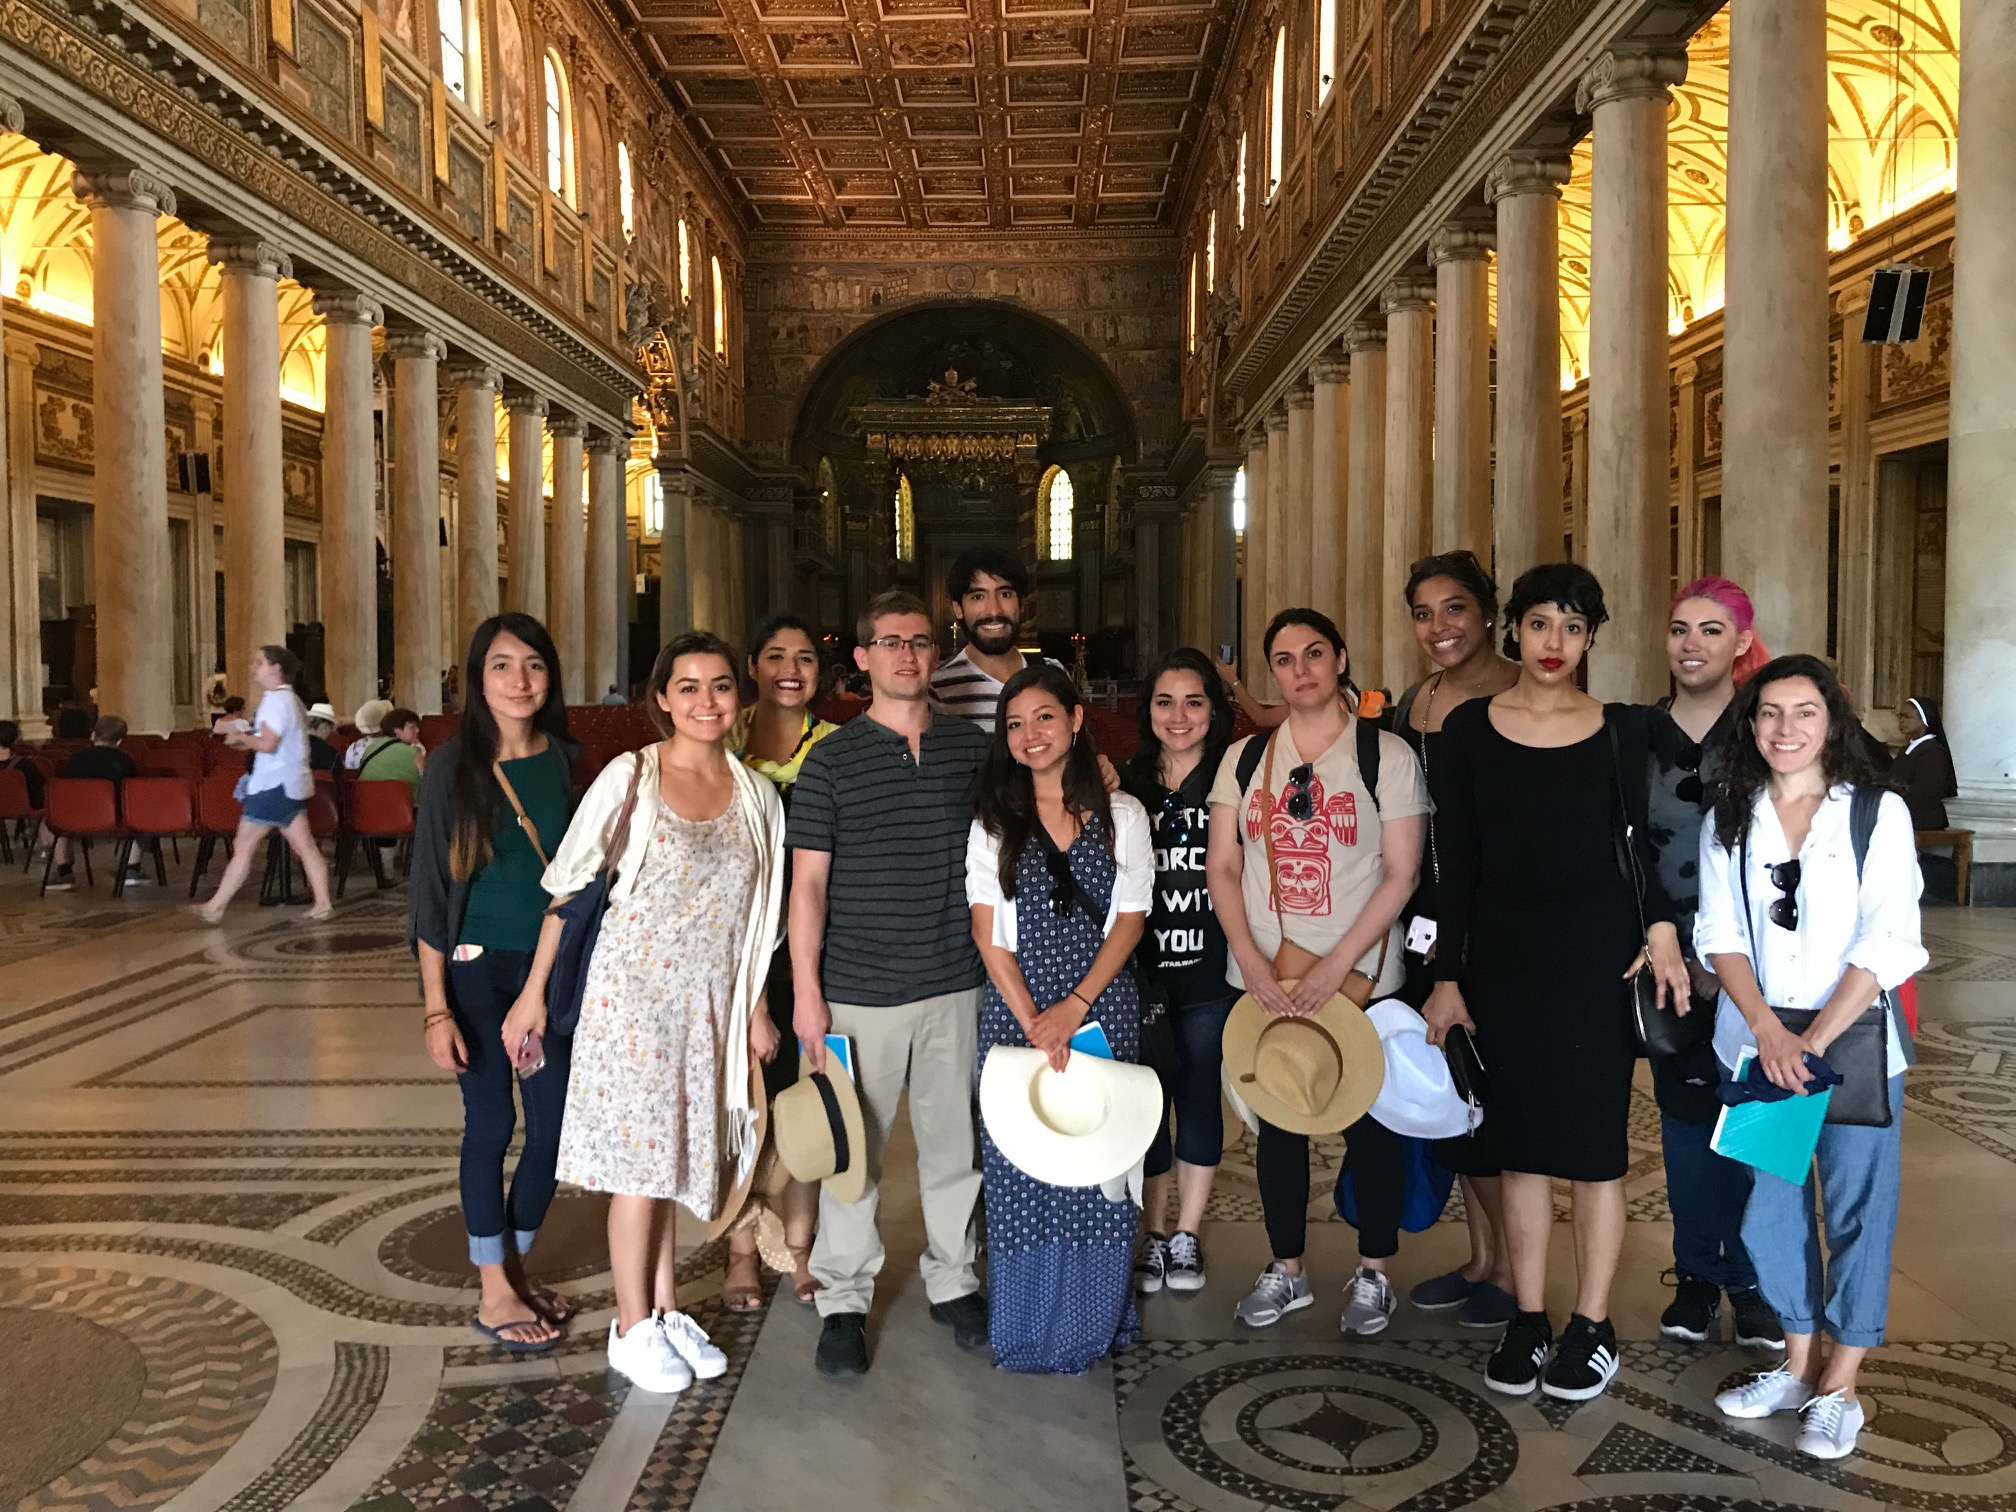 Utep Financial Aid >> Study Abroad - ROMA AETERNA